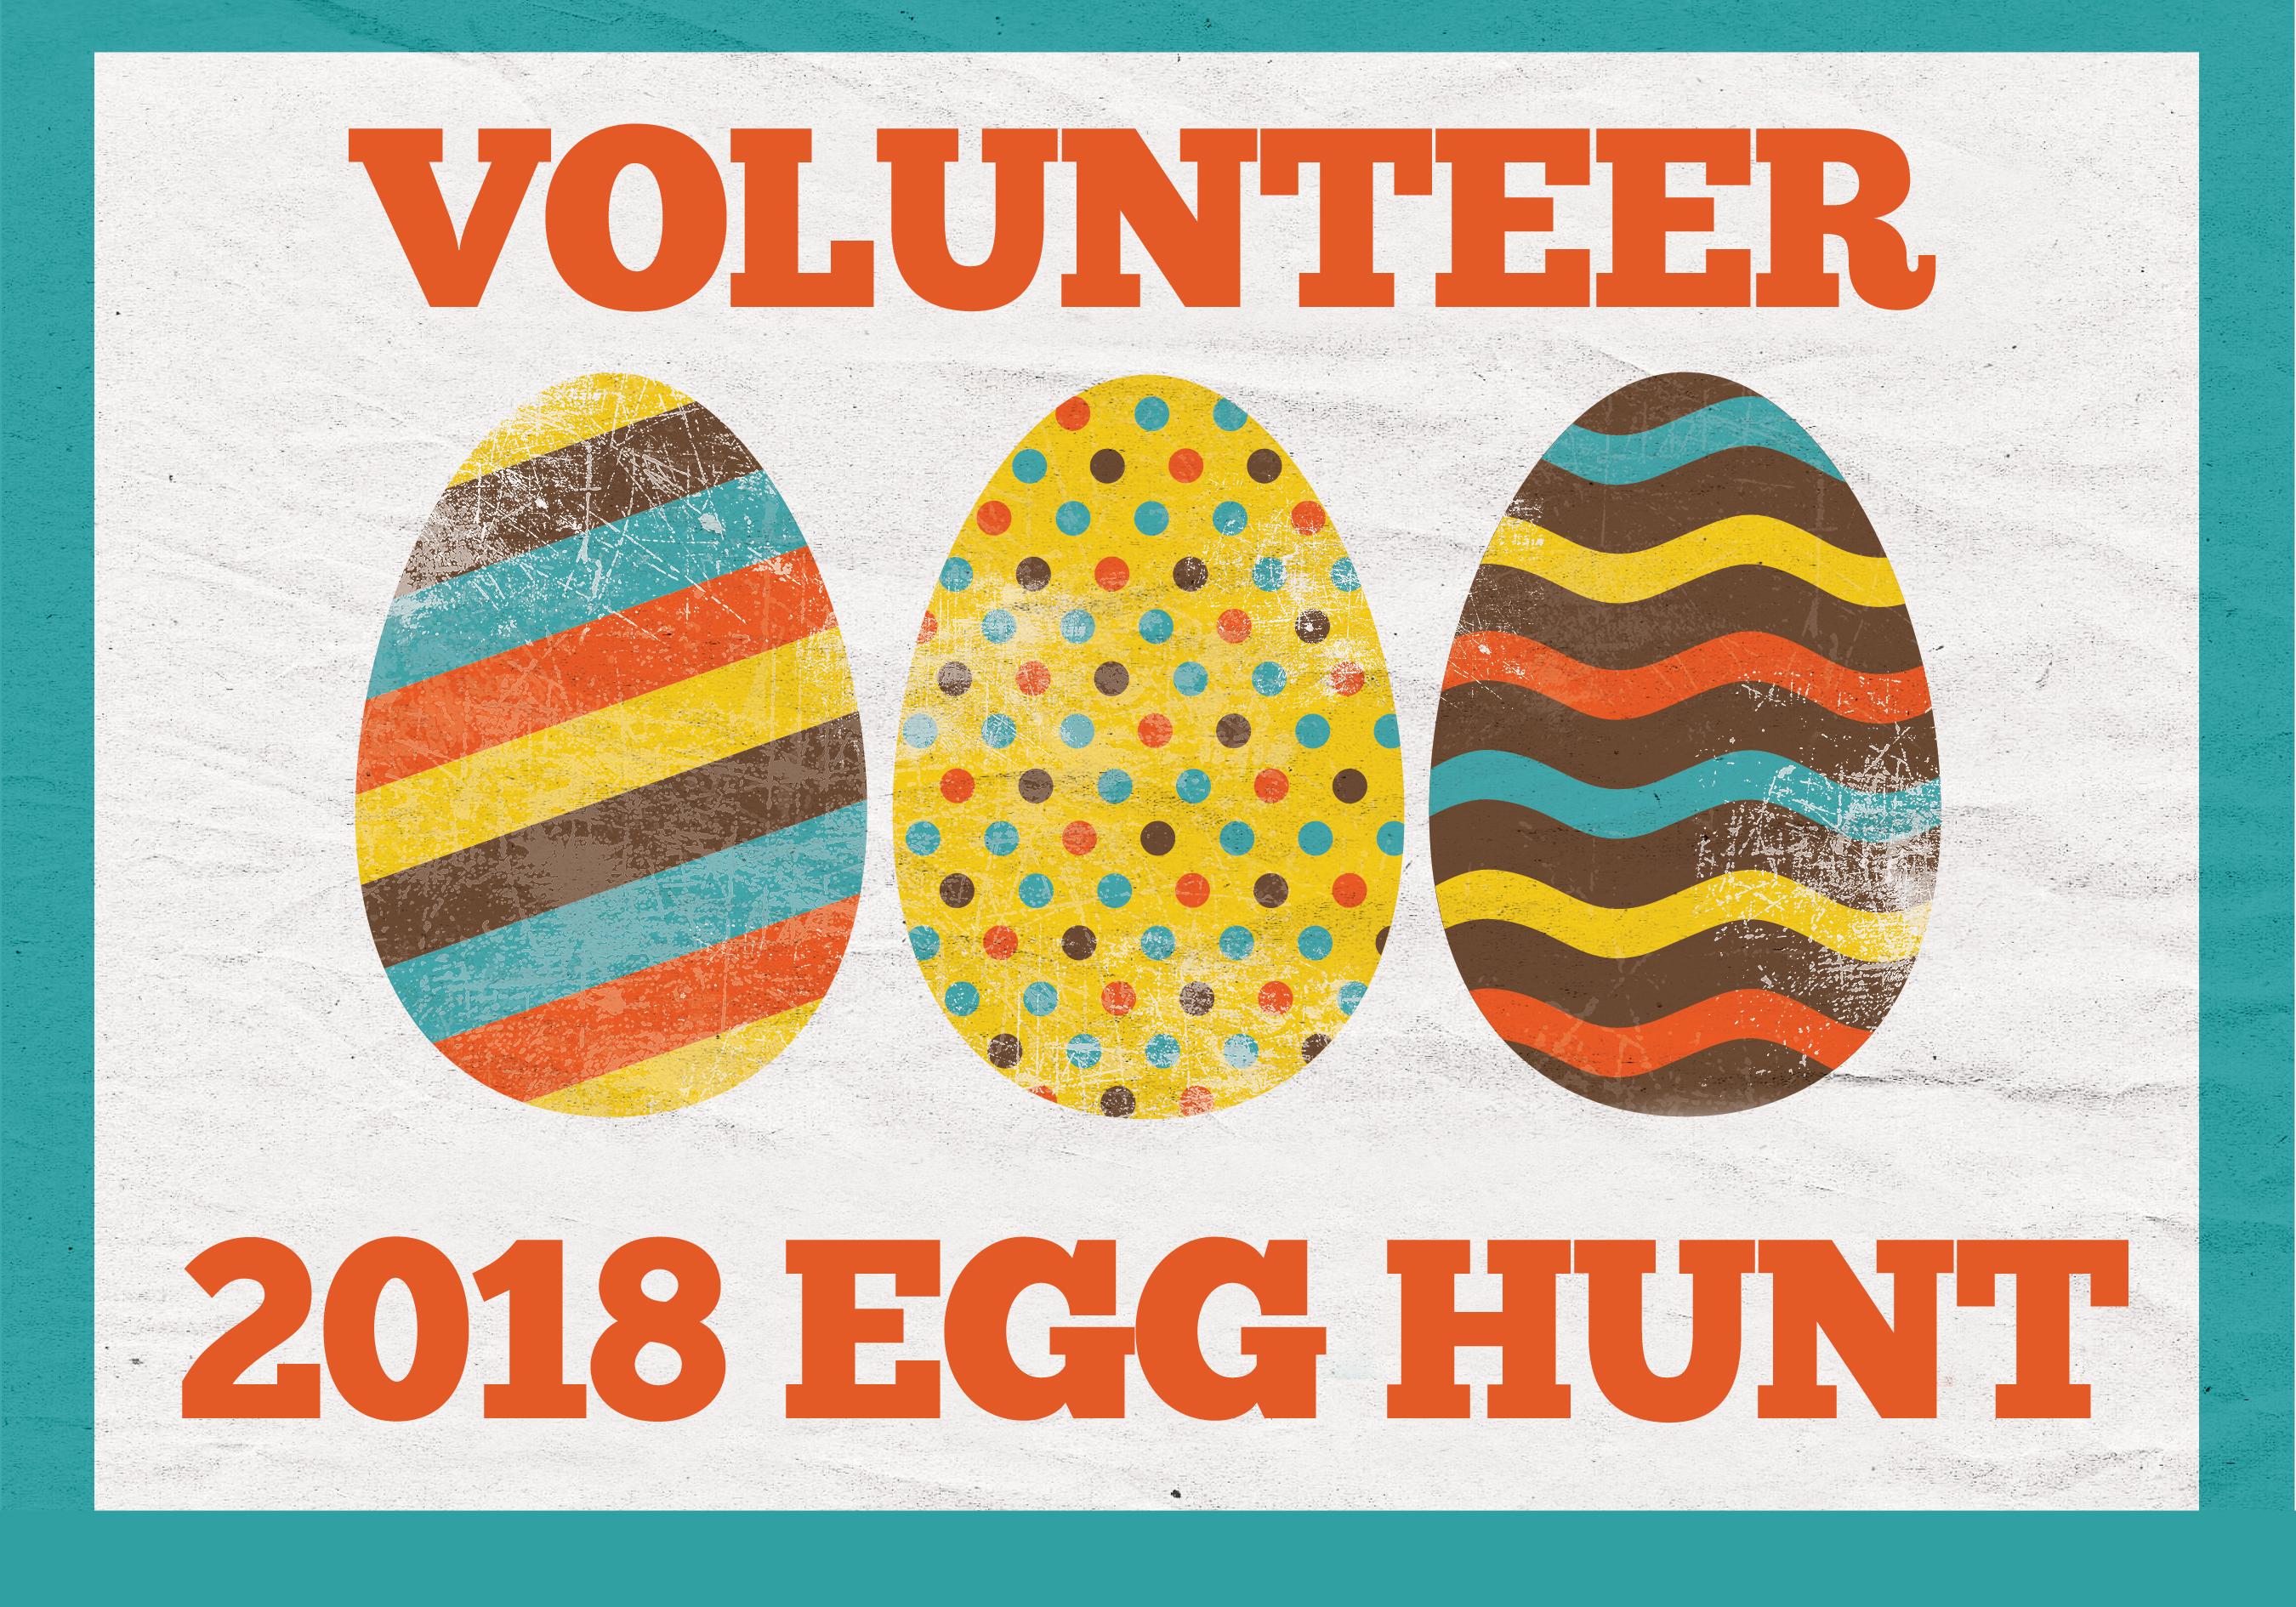 2018 egg hunt volunteer